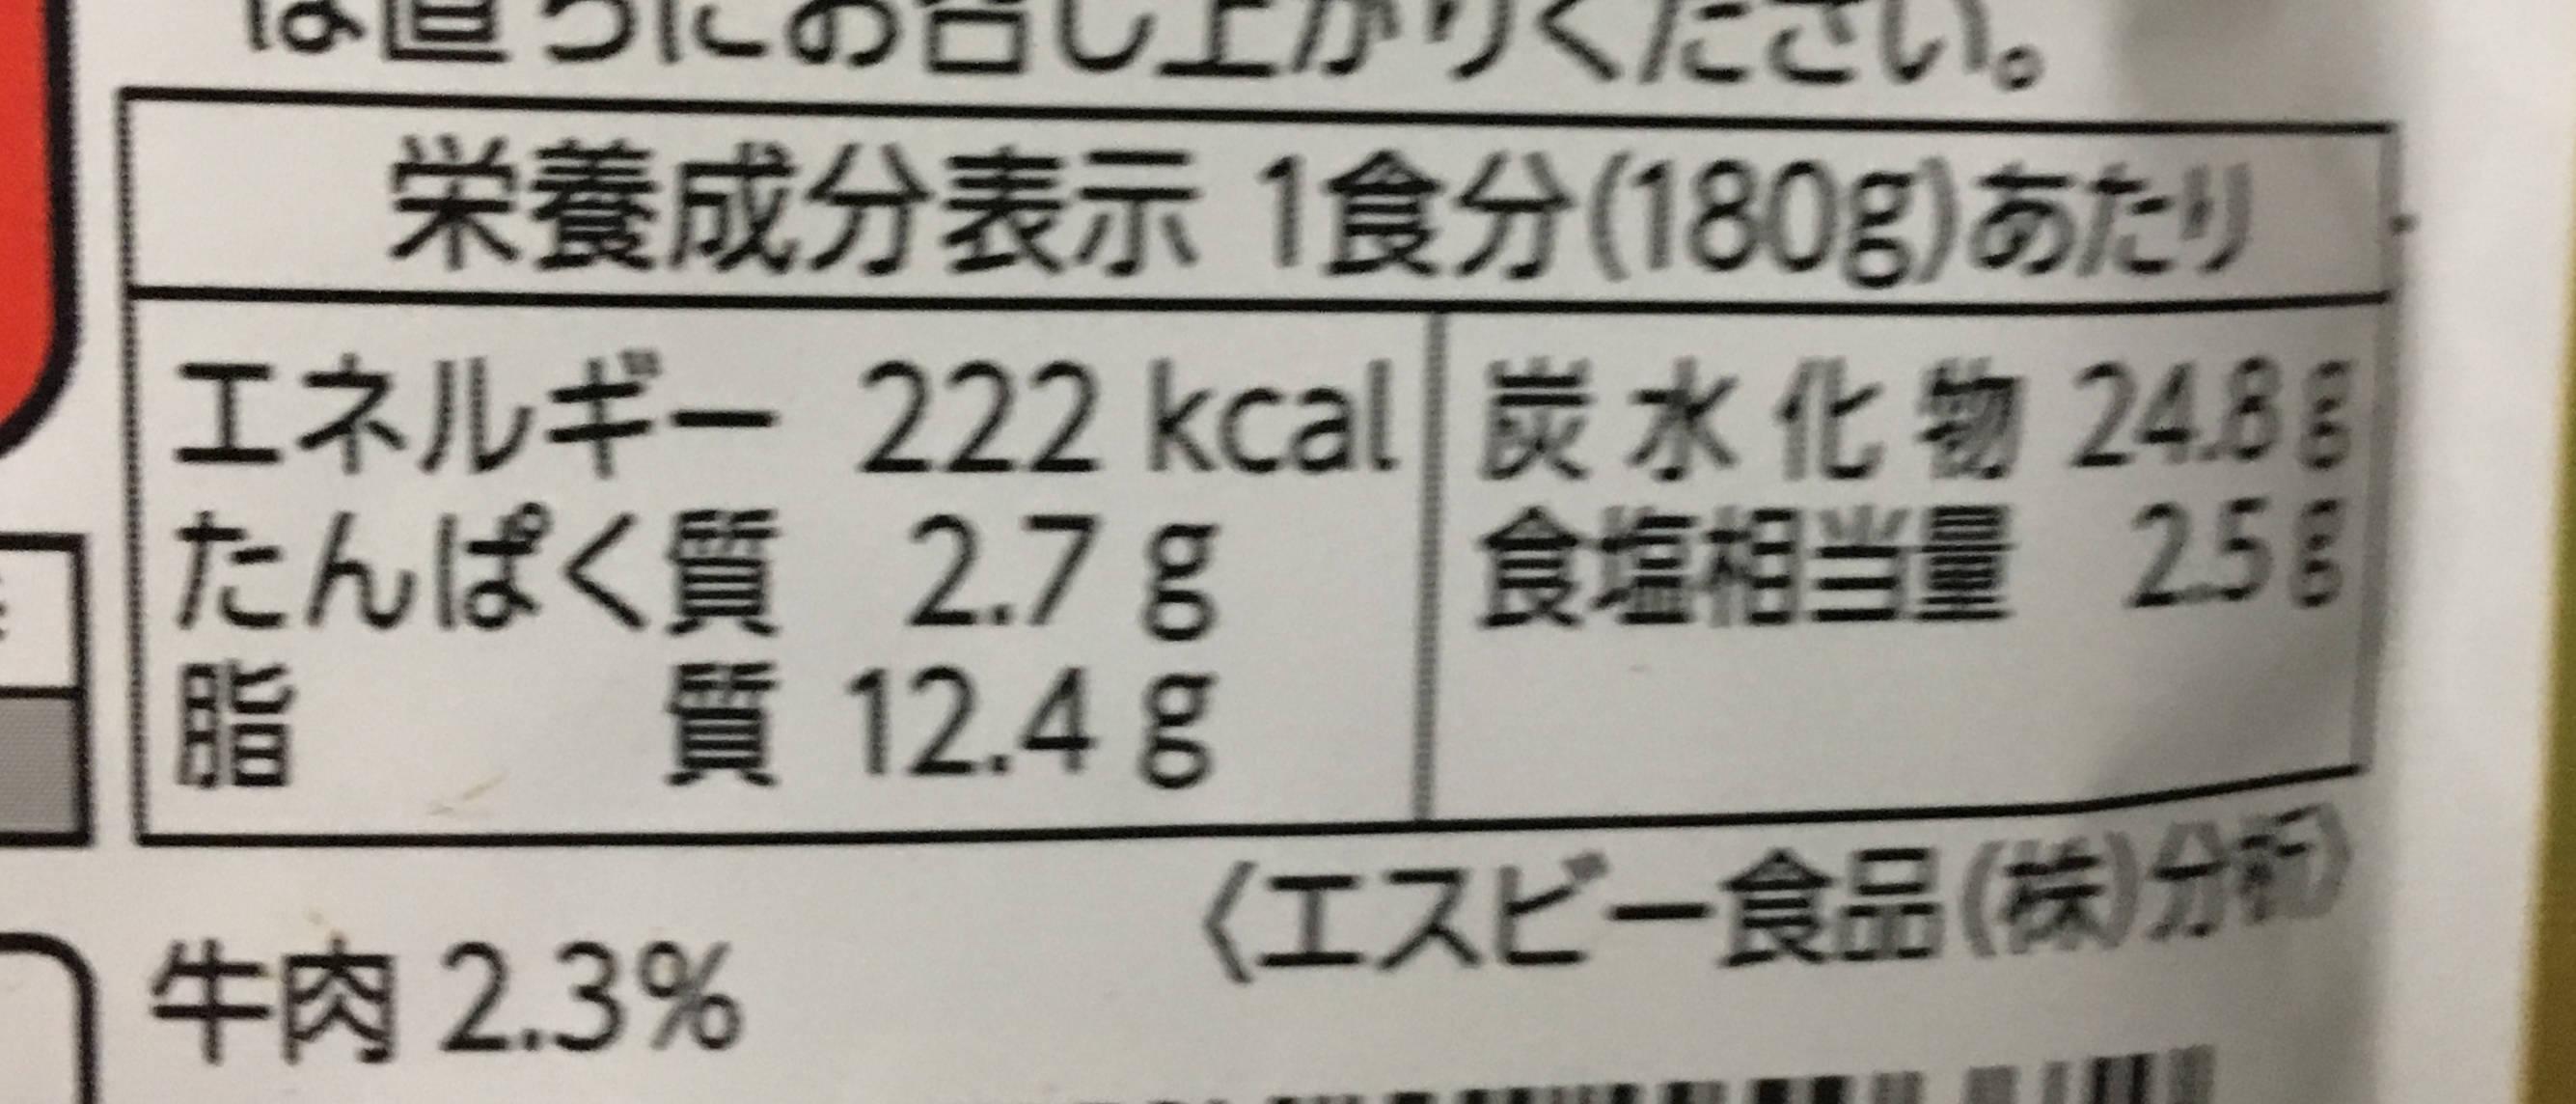 栄養成分表示:VLの欧風カレー中辛